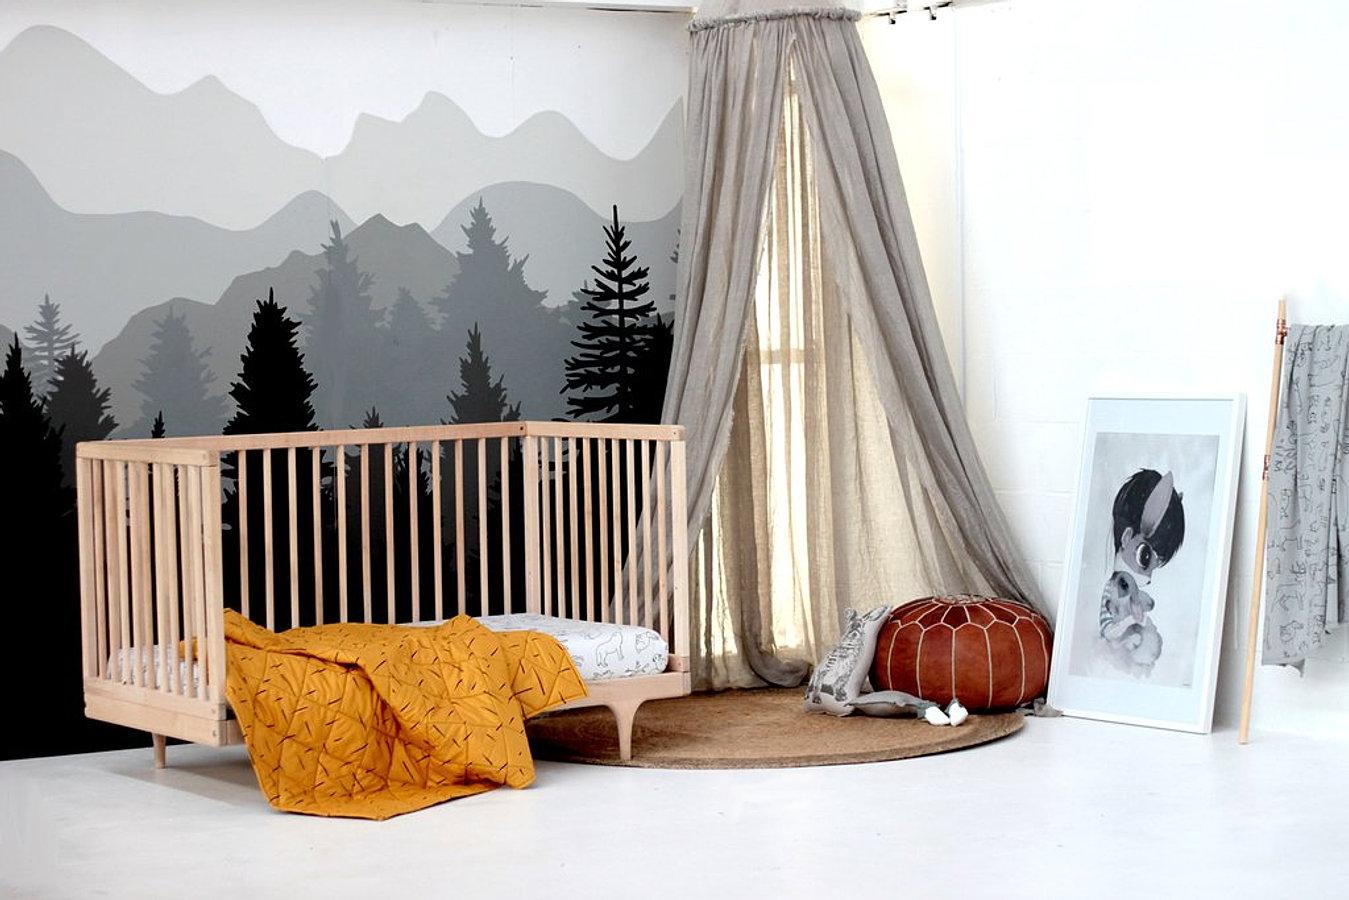 woodland_cot_1024x1024 - Home Decor Nz